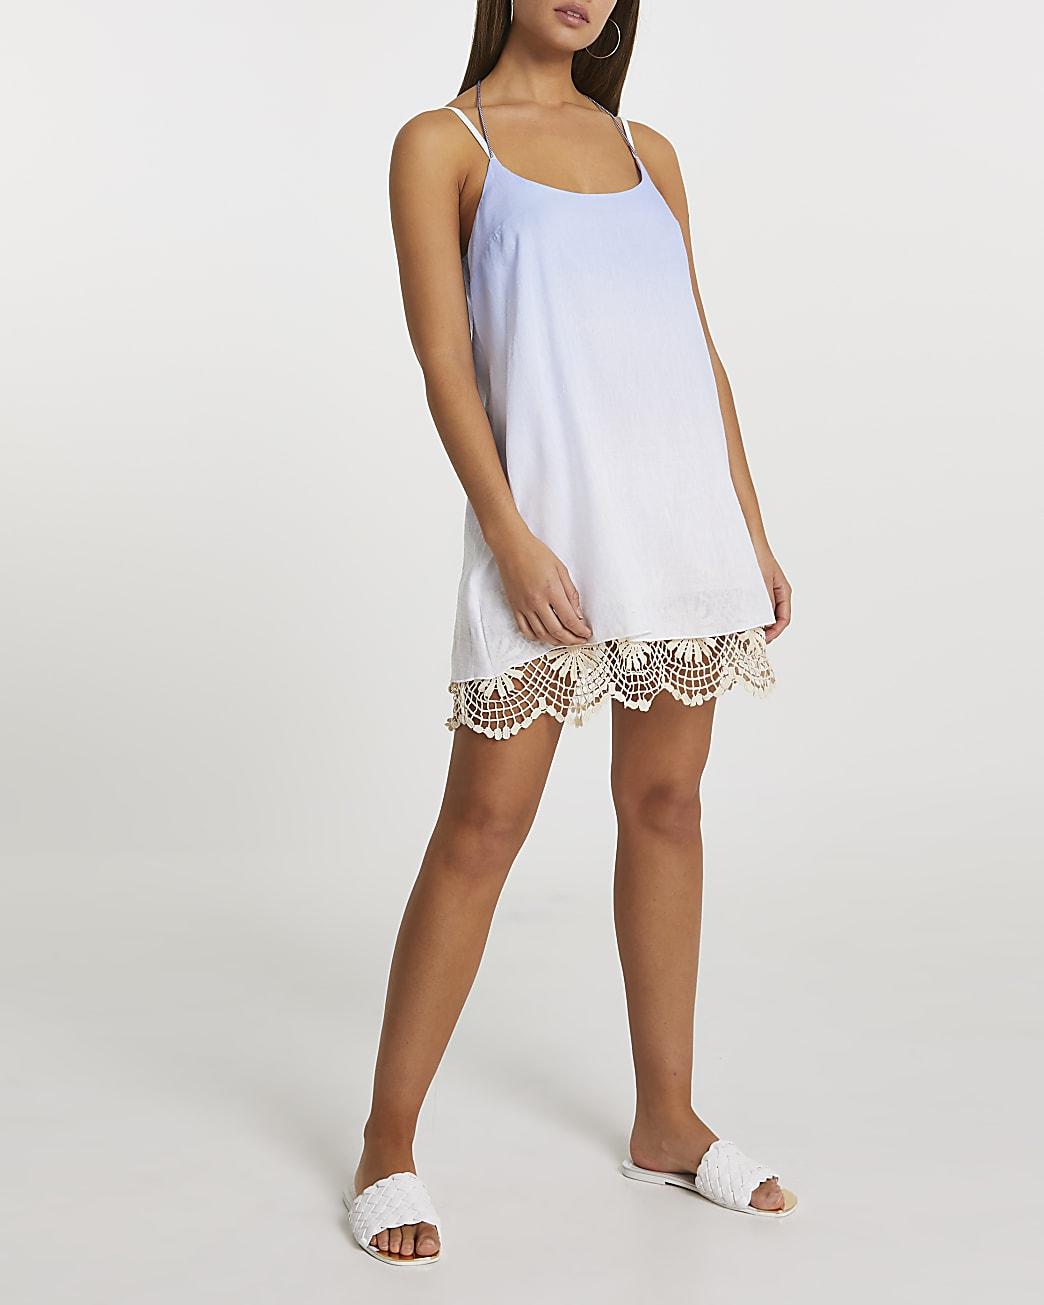 Blue crochet mini beach dress